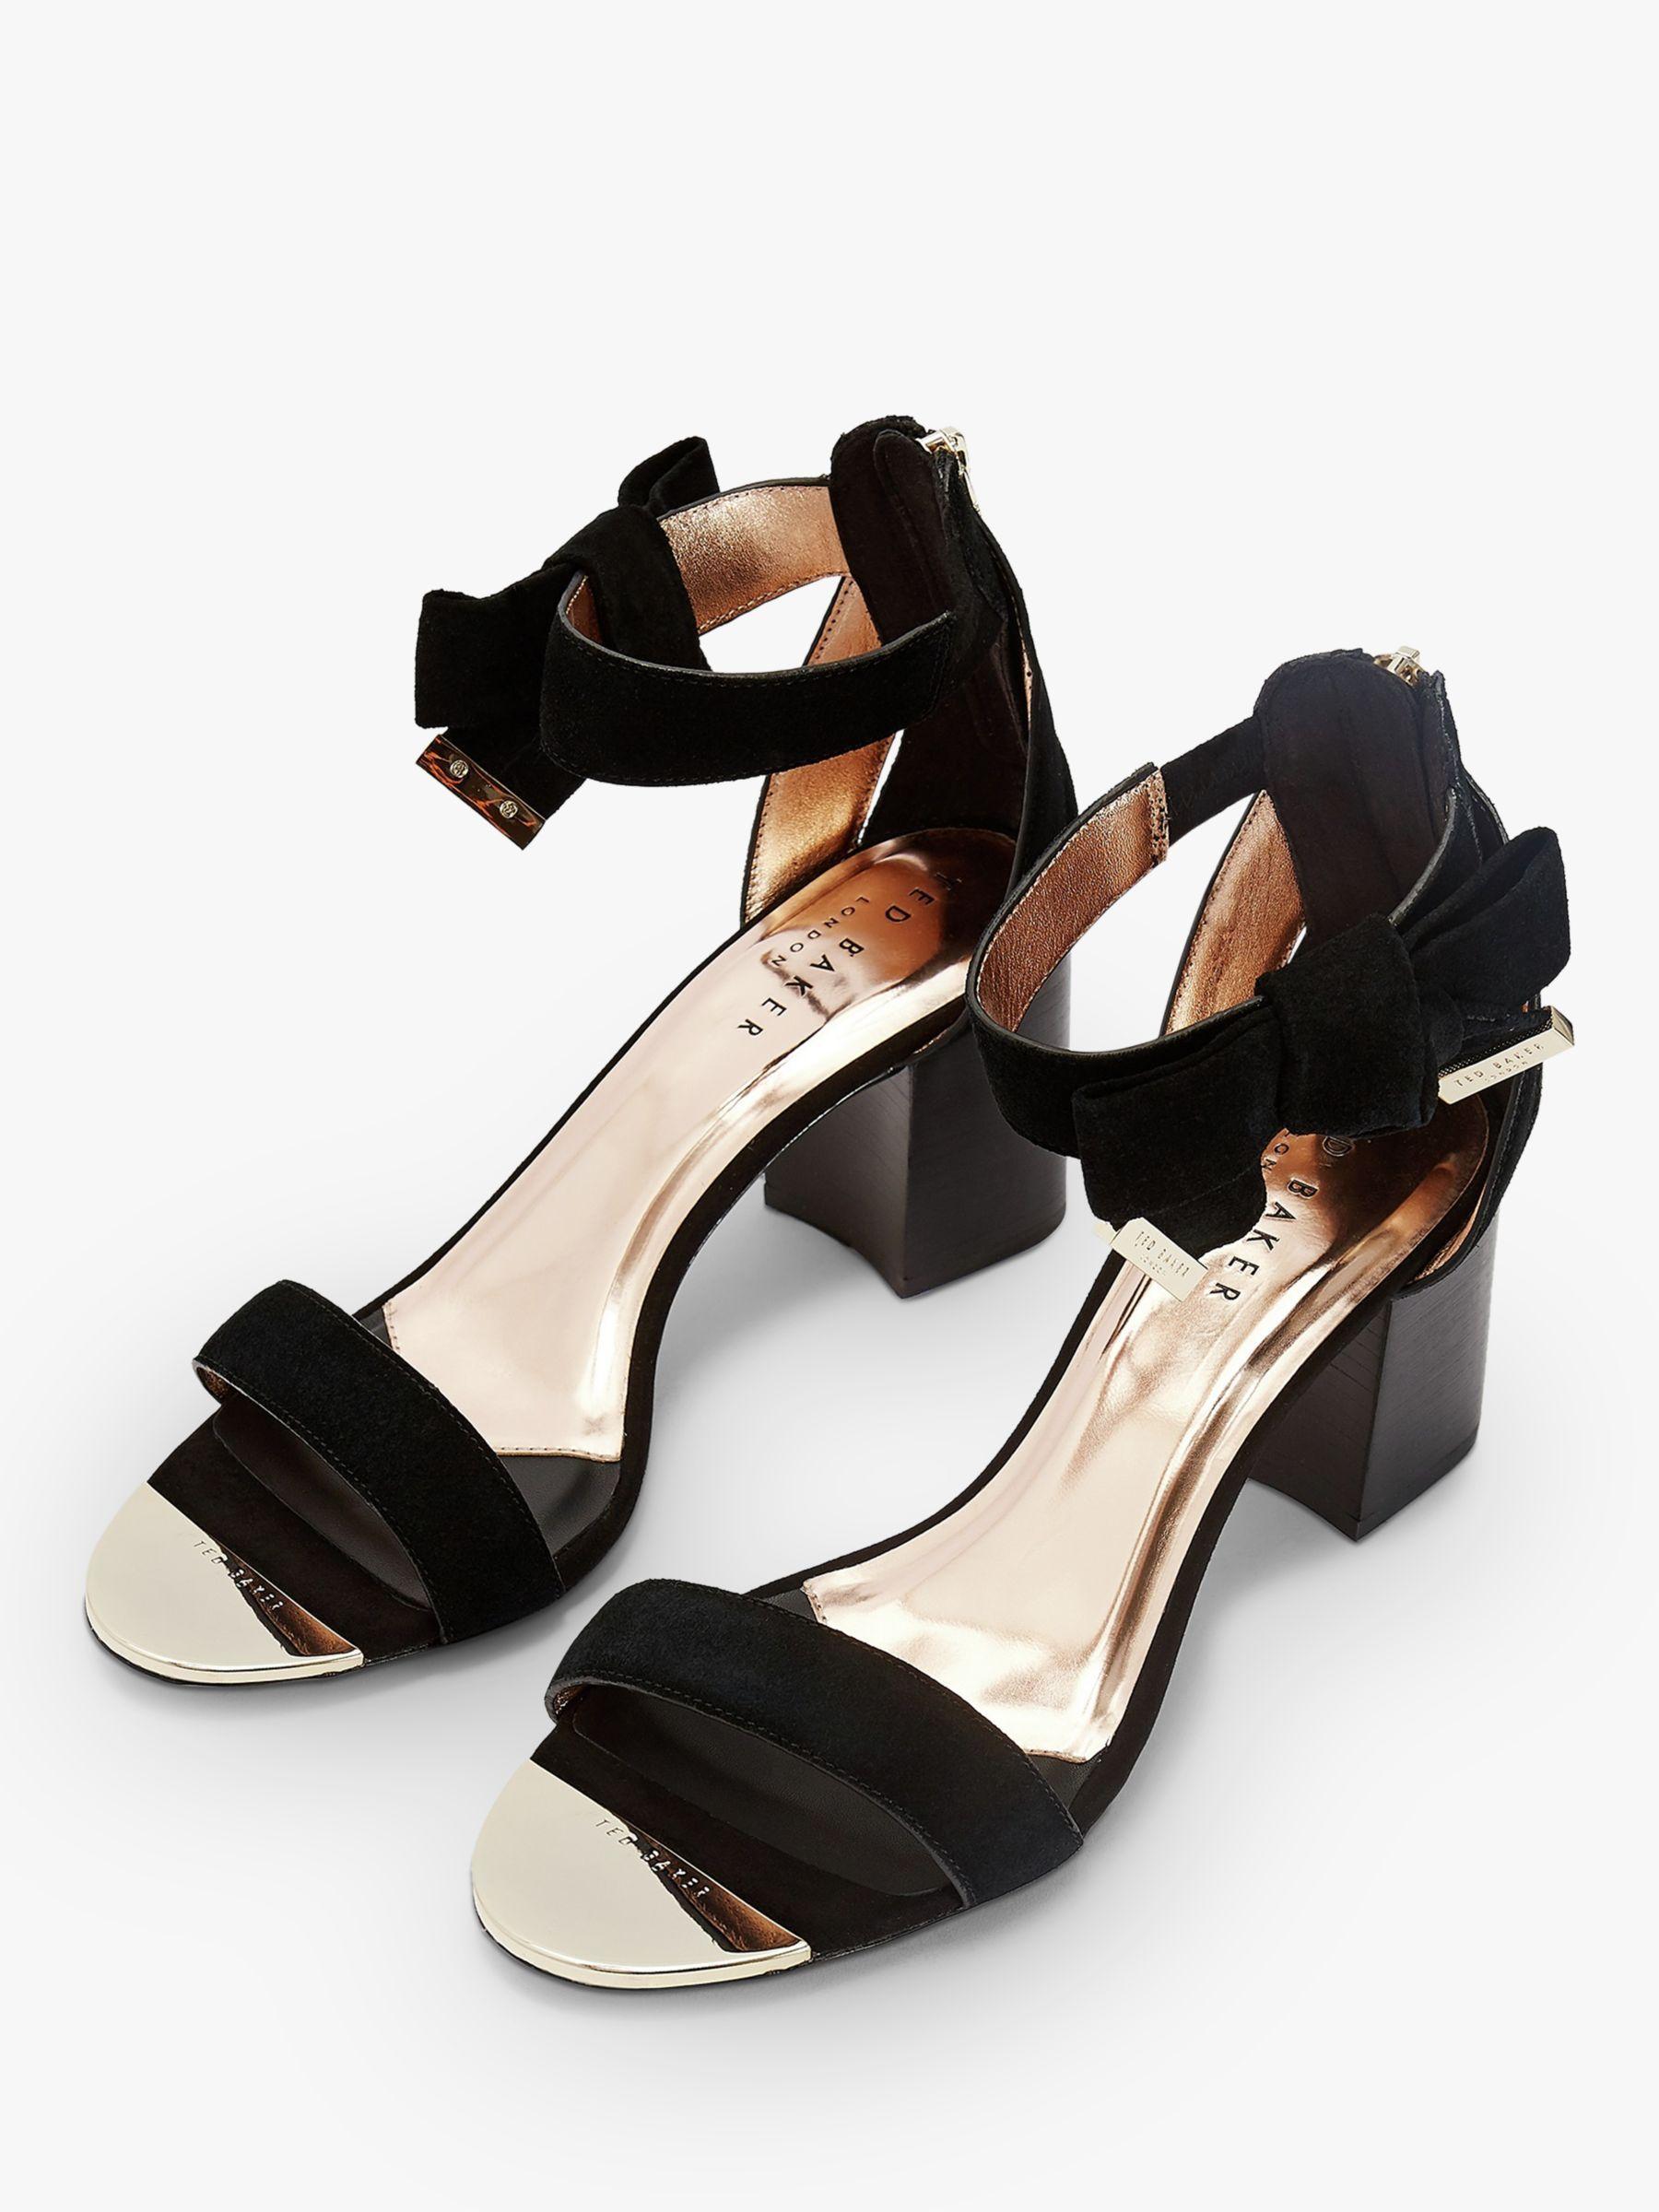 Ted Baker Loopie Suede Block Heel Sandals, Charcoal   Womens